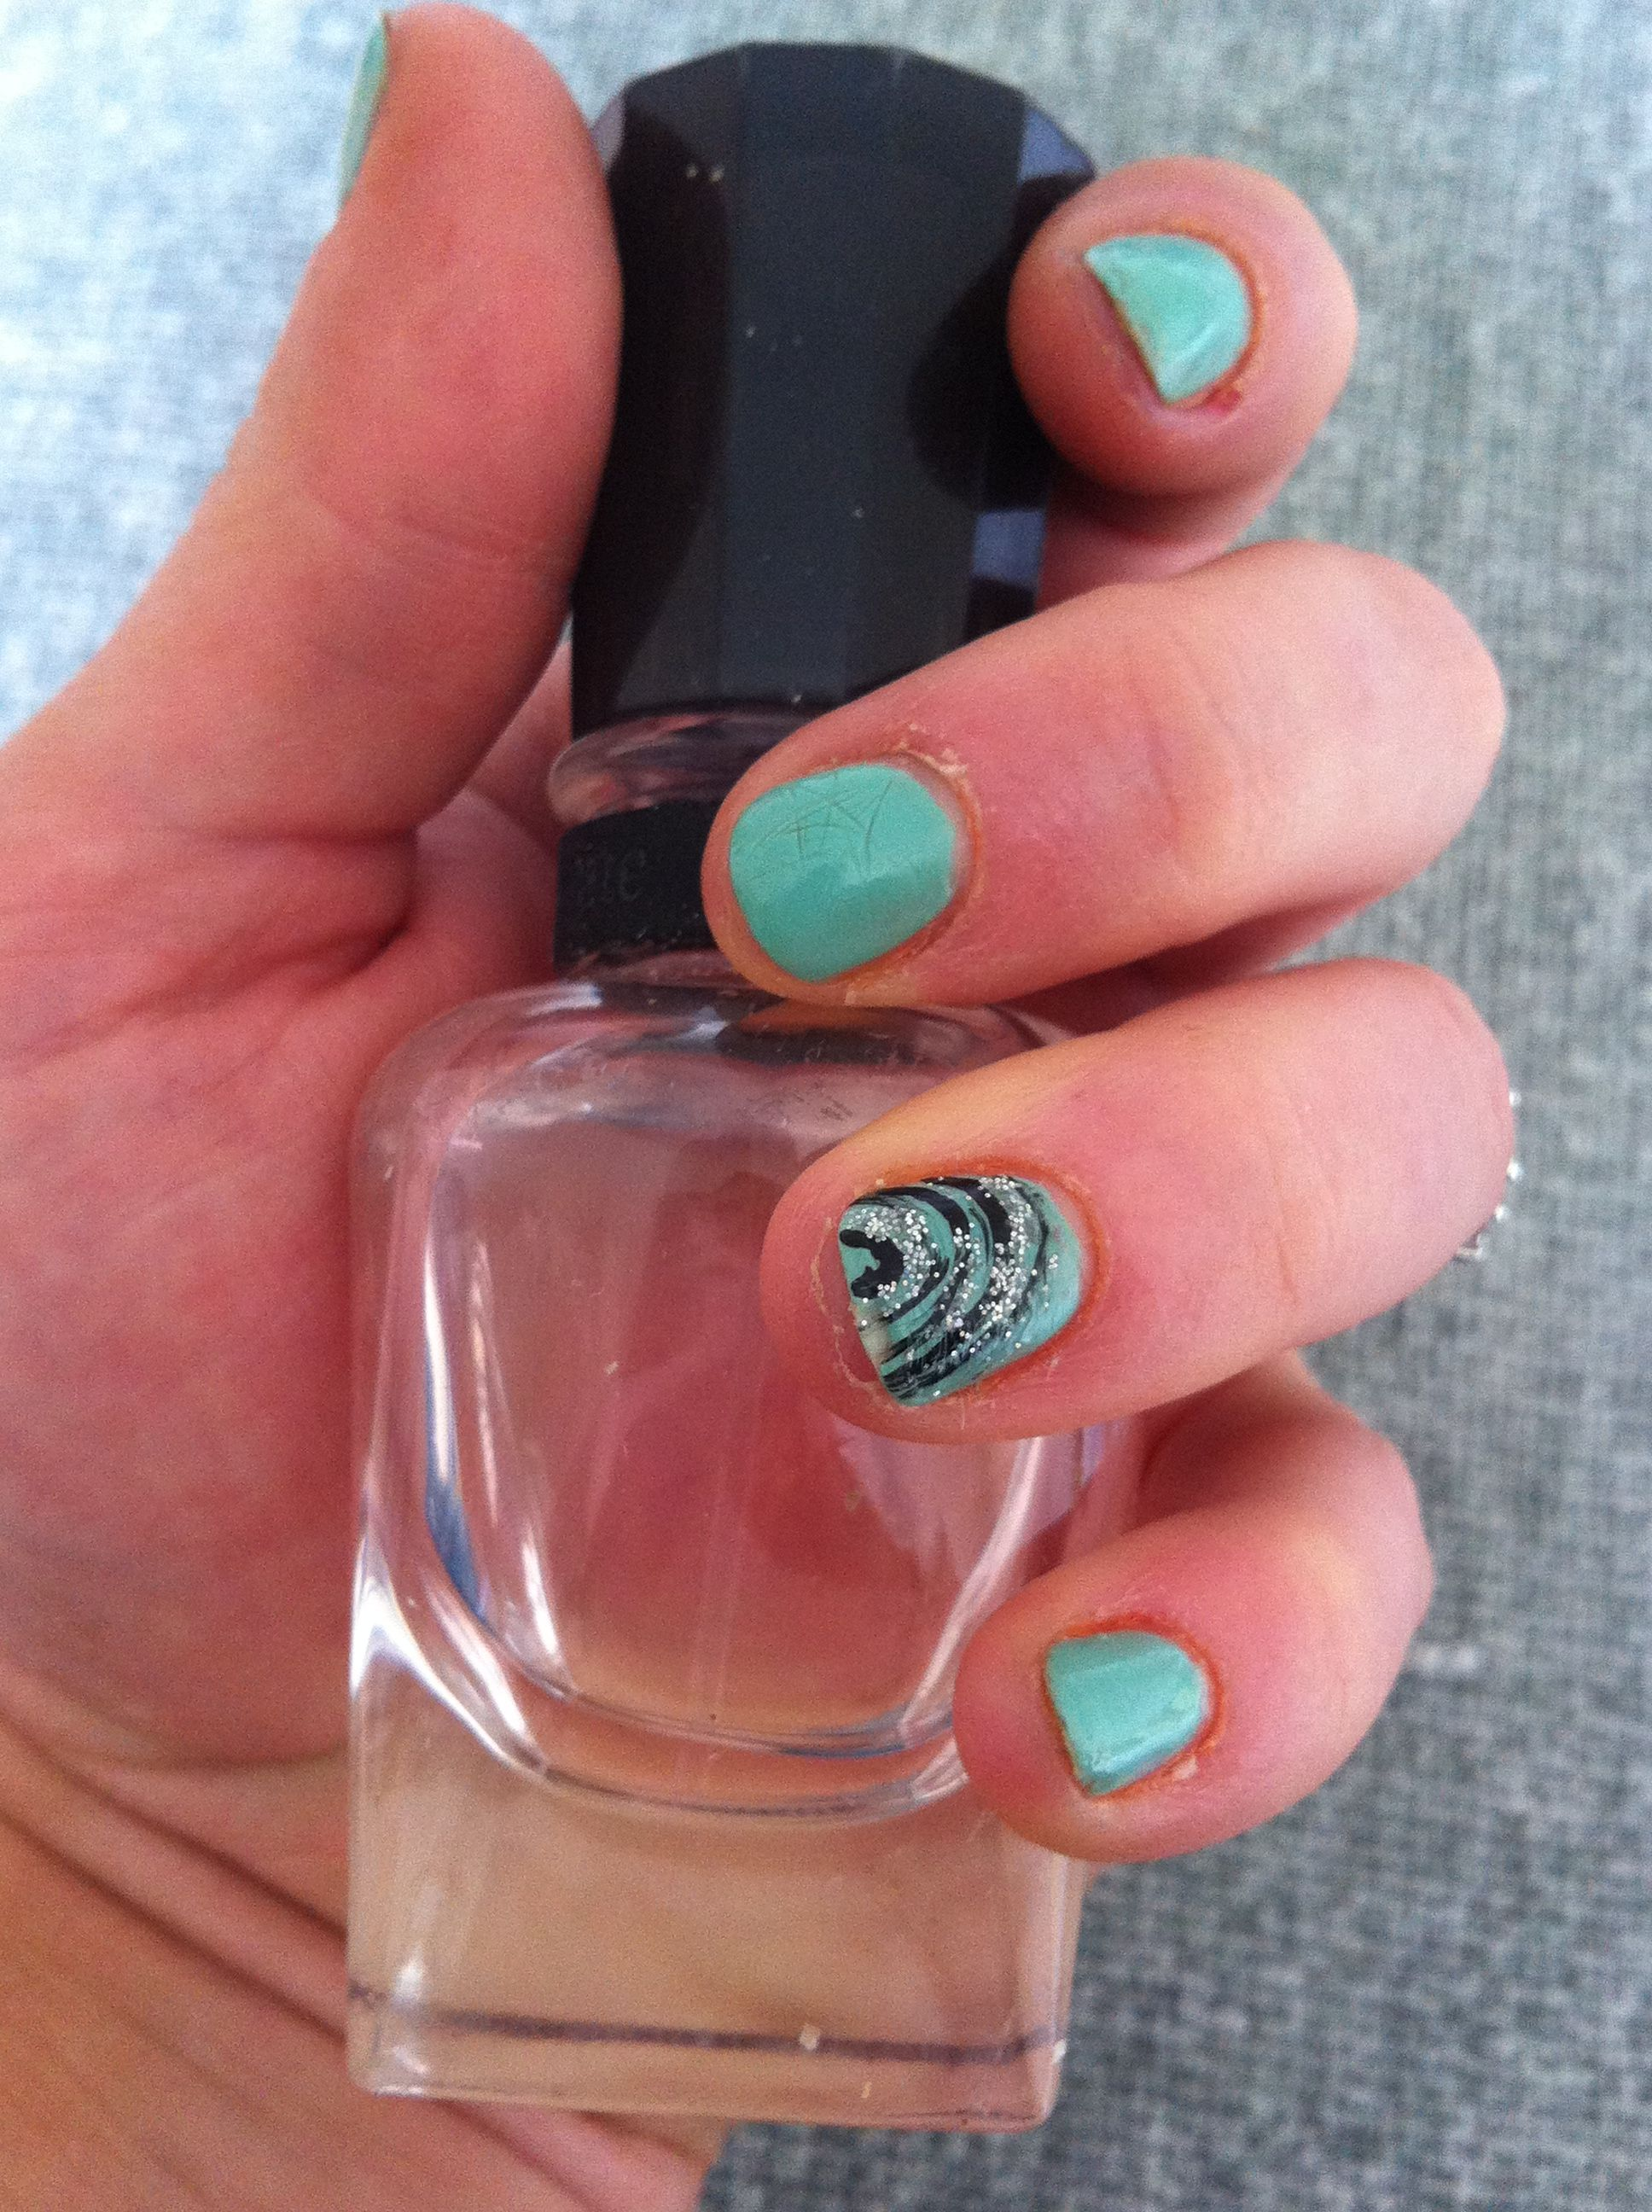 Funky nail design for short nails!